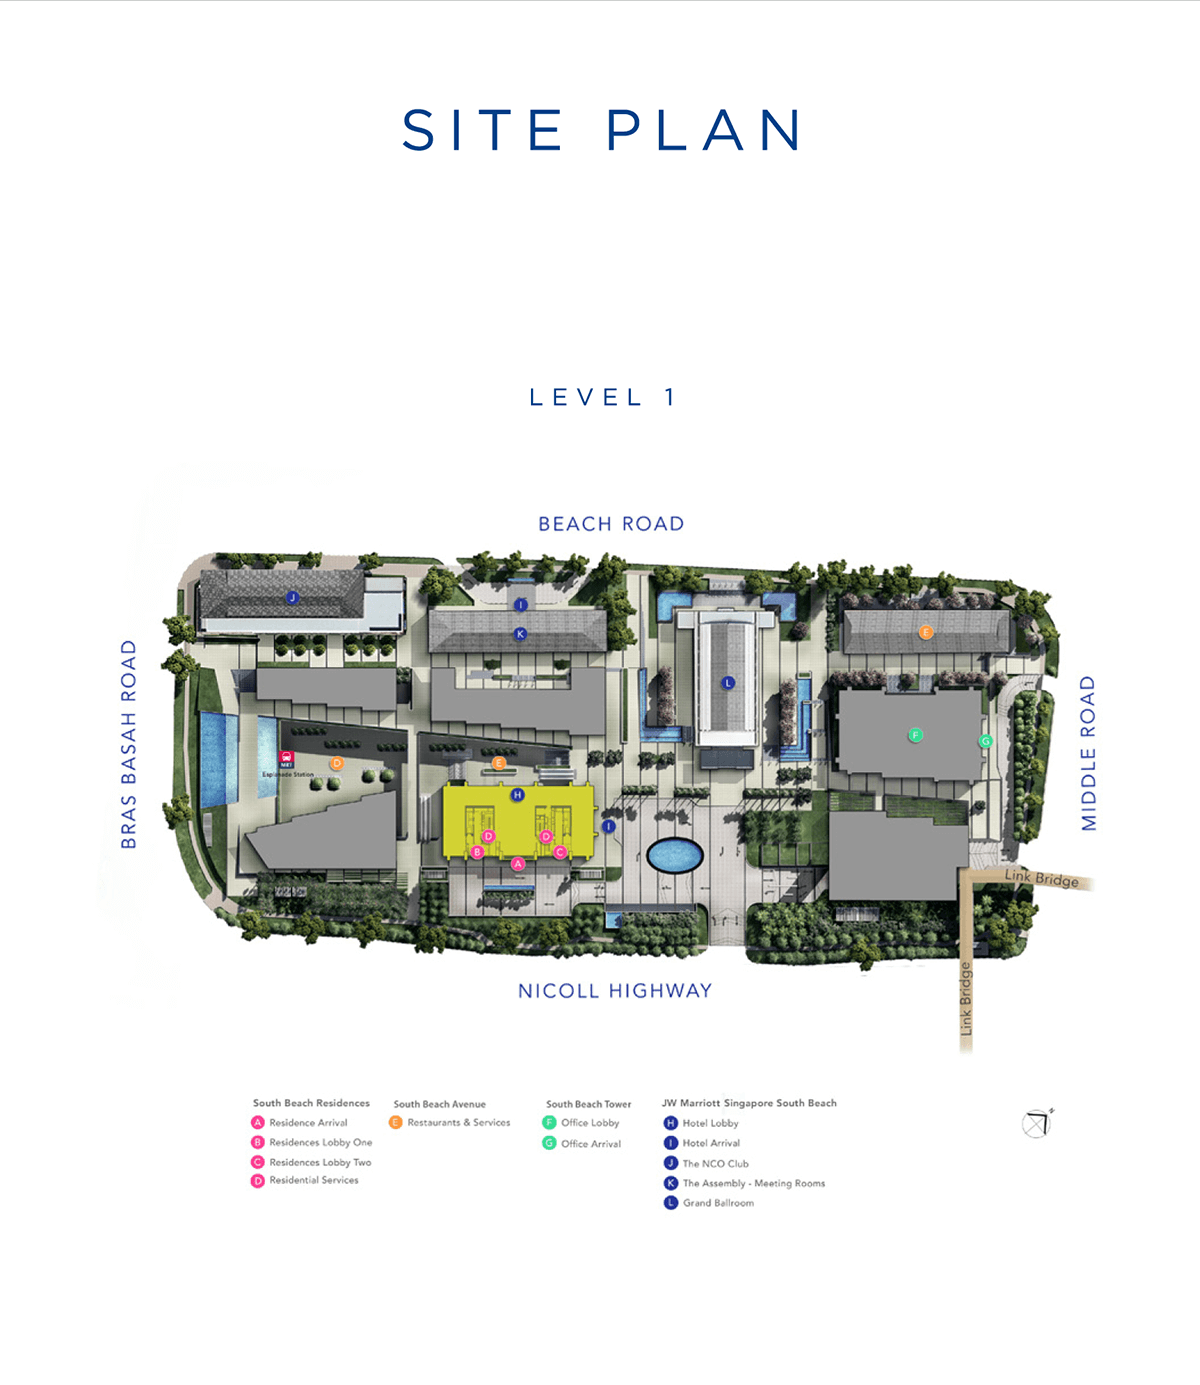 South Beach Residences Site Plan Level 01